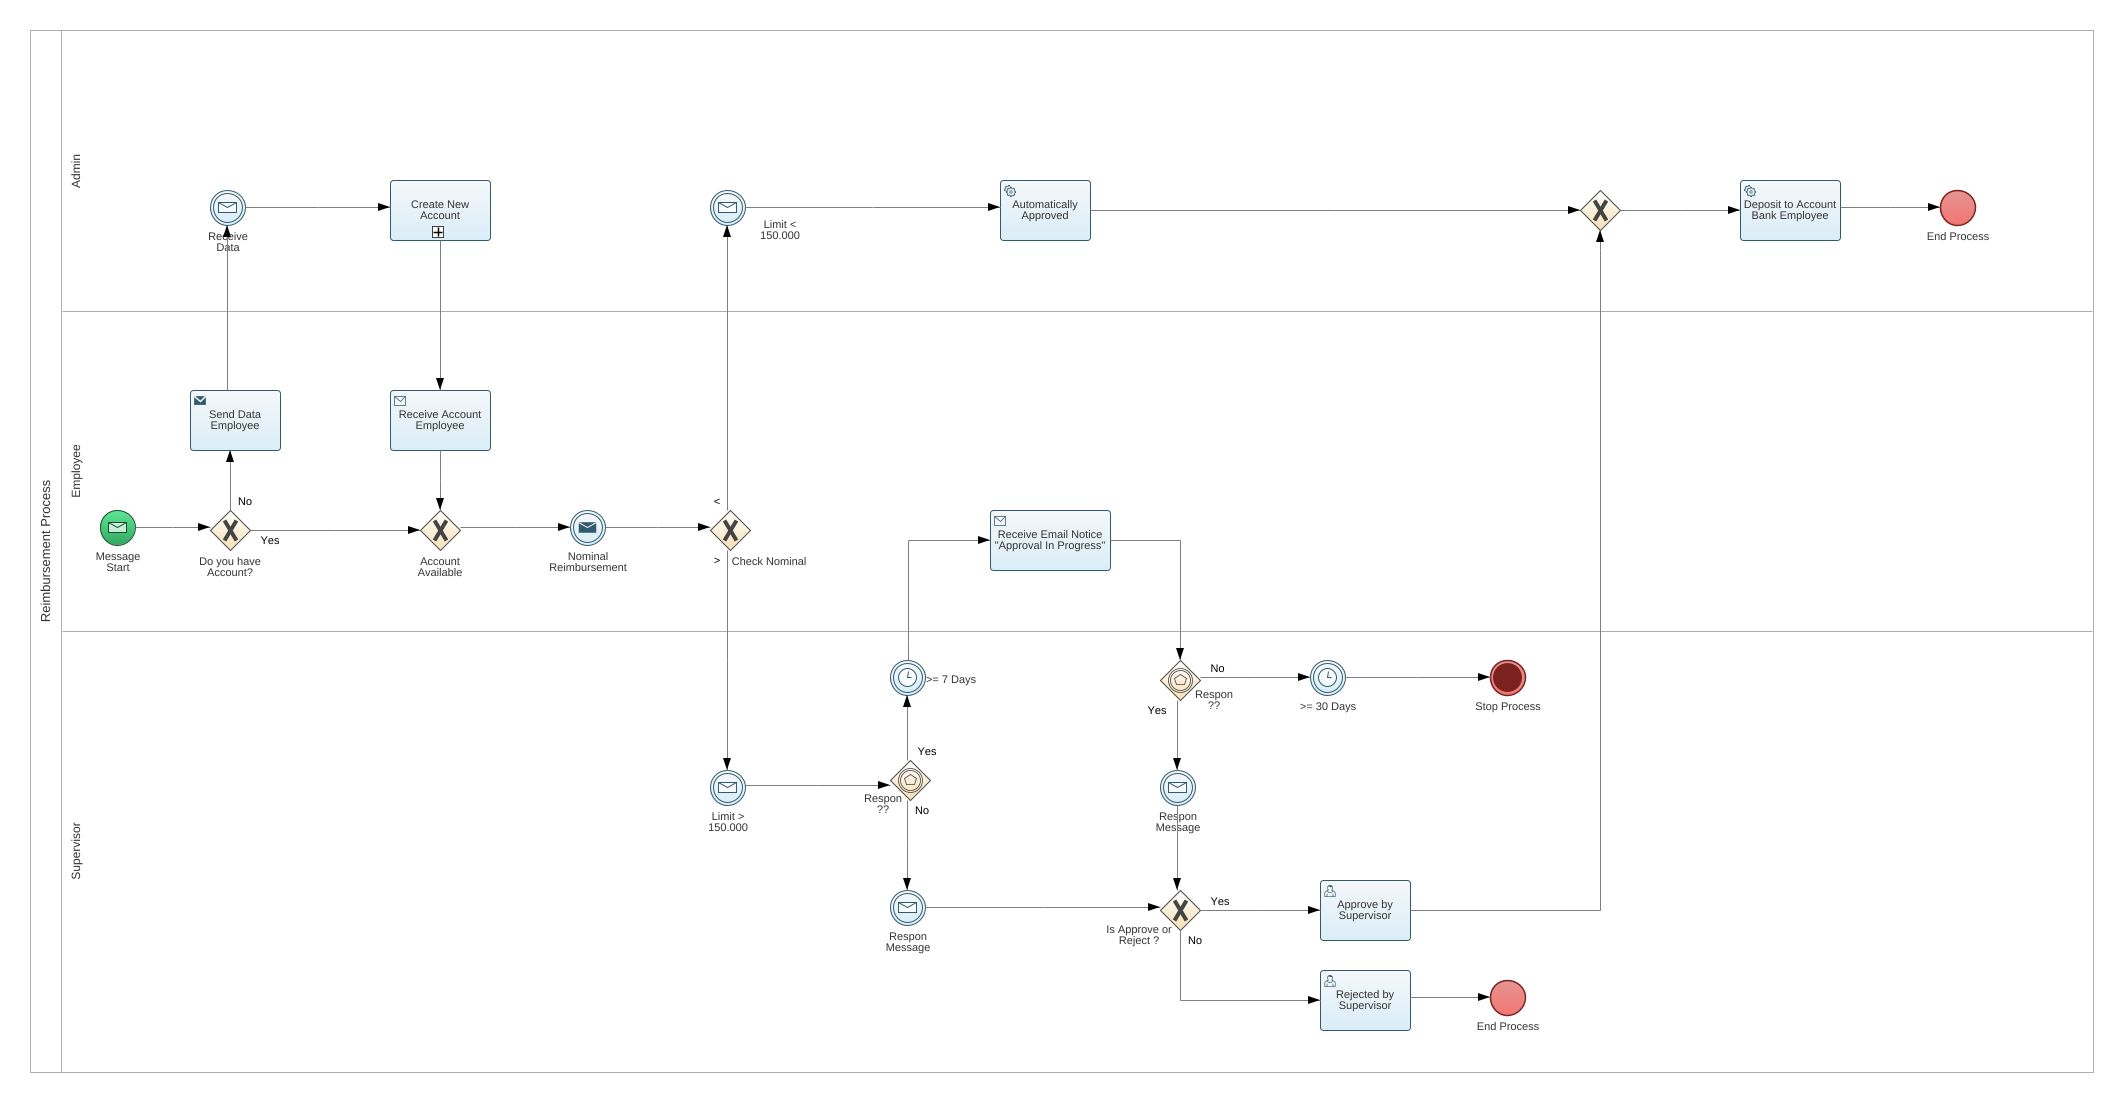 Reimbursement process bpmn2 diagram reimbursement process bpmn2 jpeg png svg collaboration diagram pooptronica Choice Image